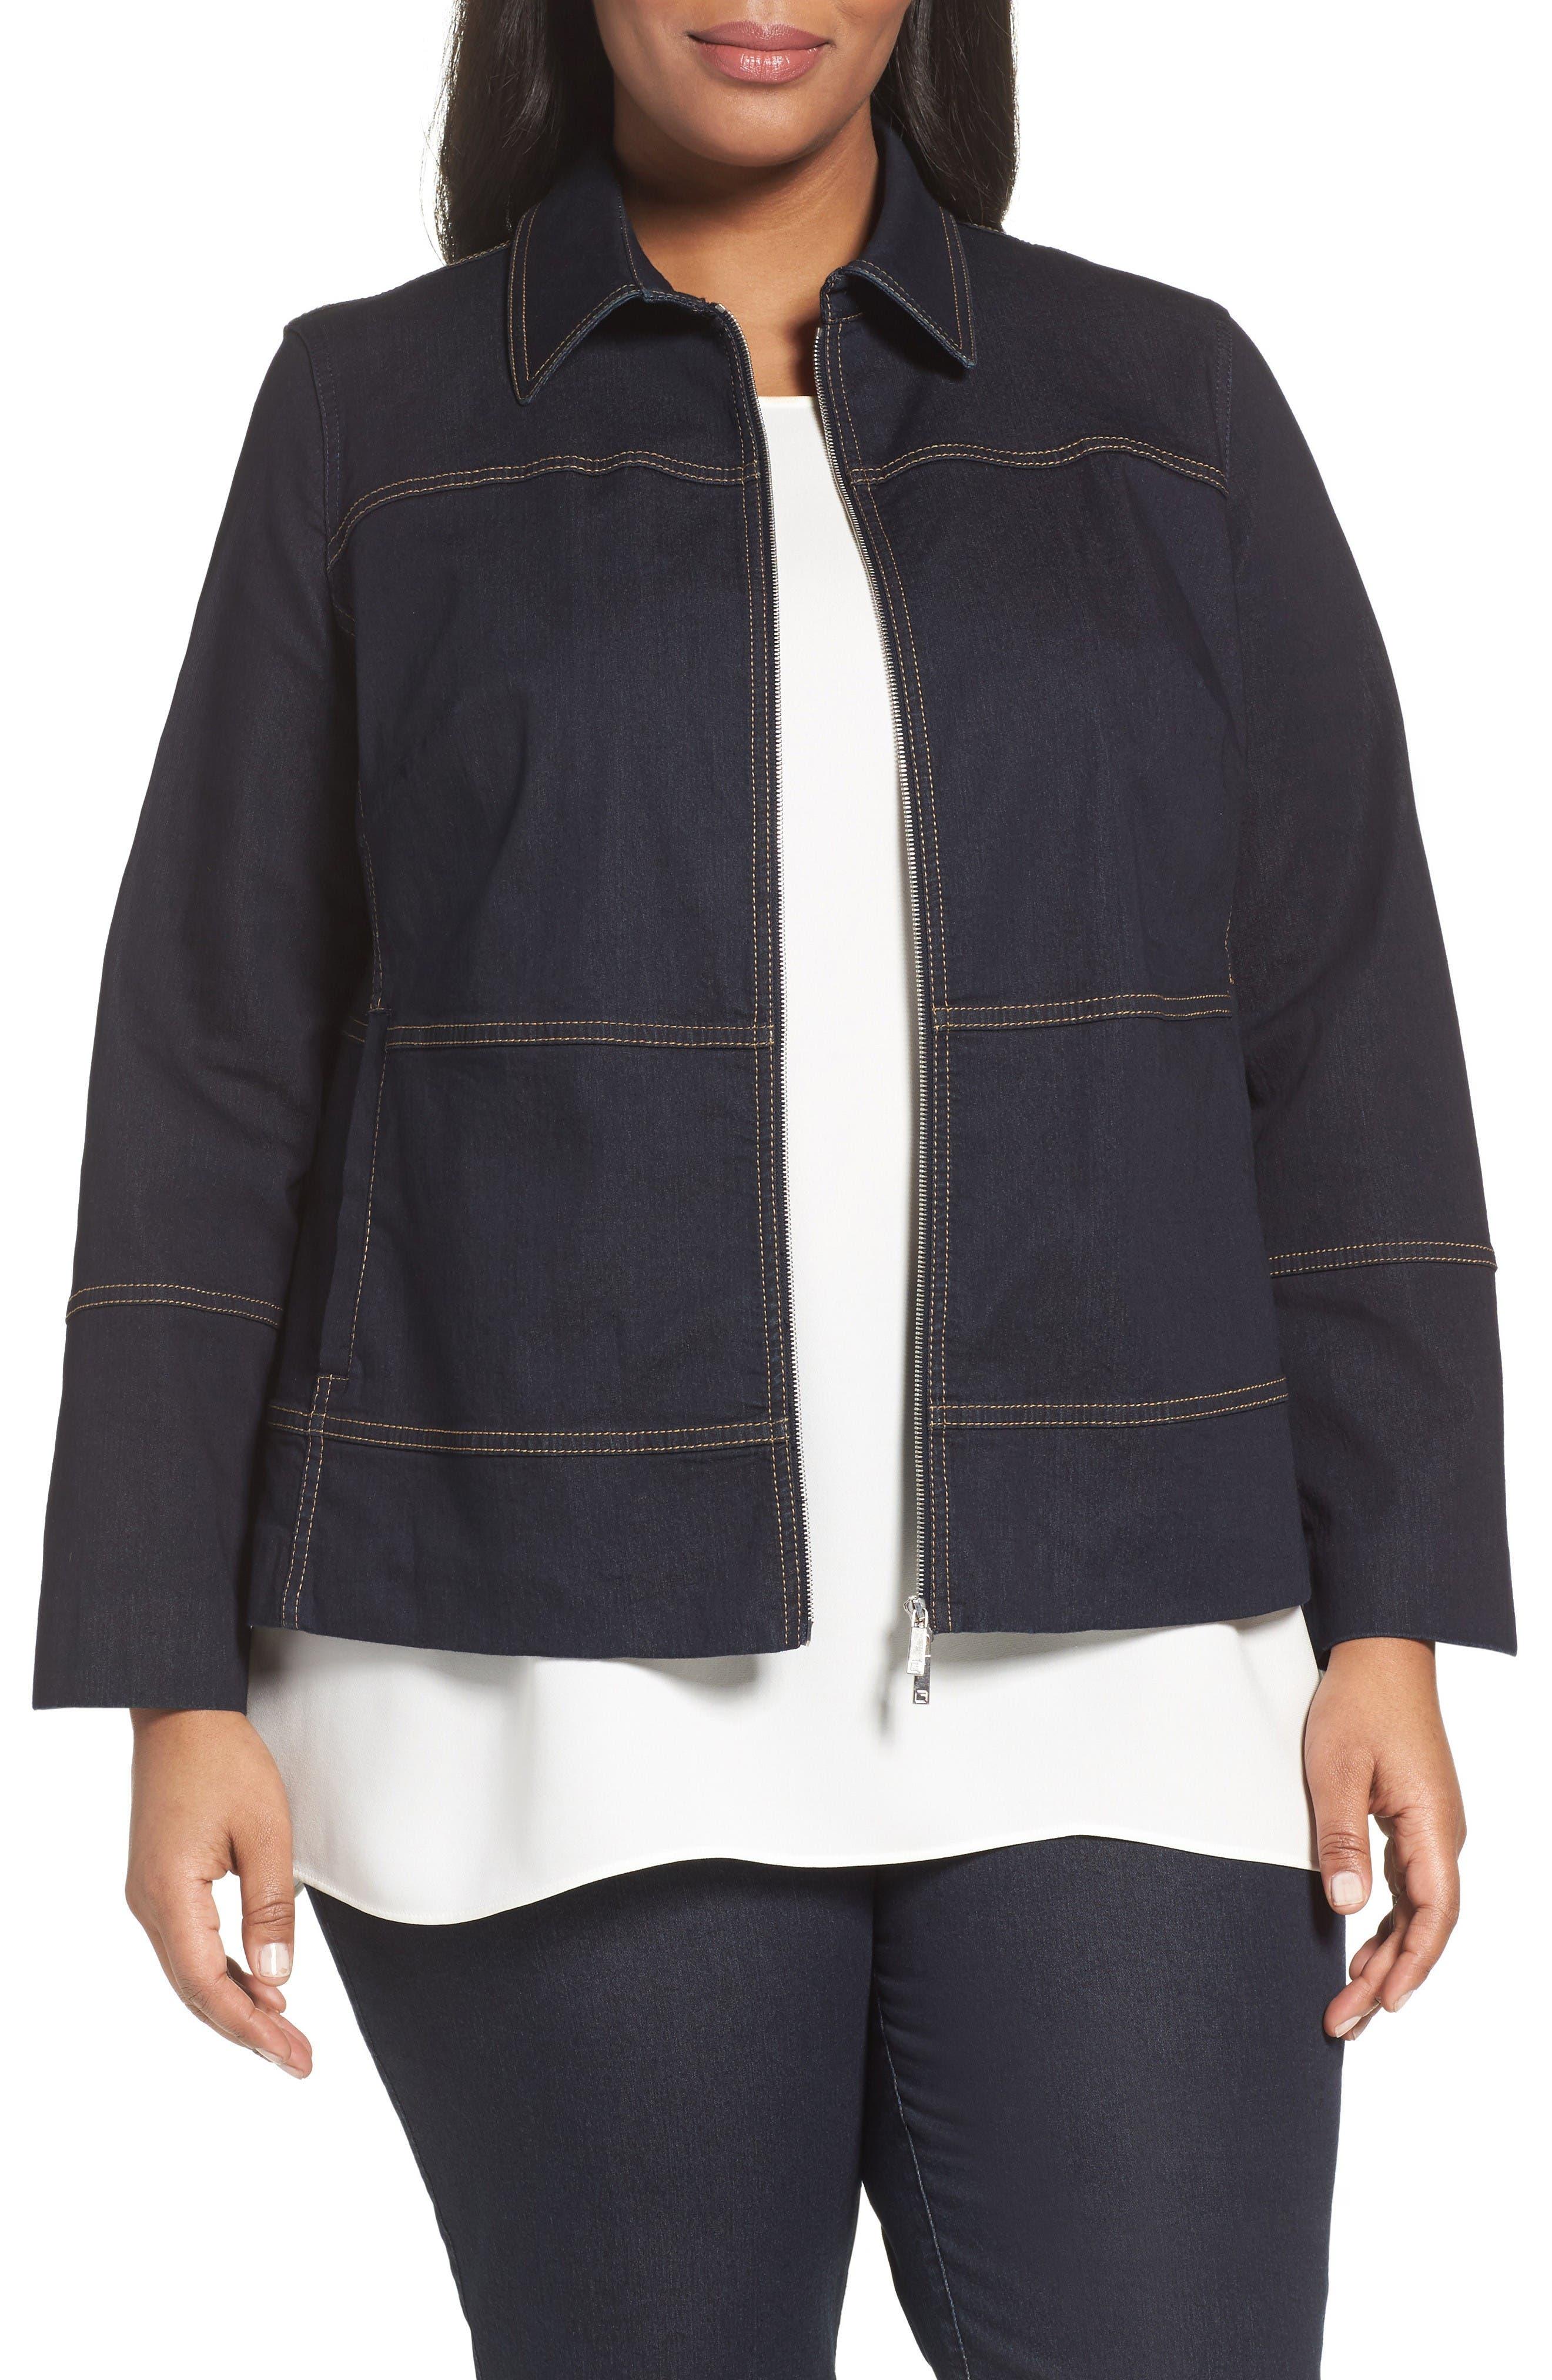 Adaya Collared Denim Jacket, Plus Size Lafayette 148 New York